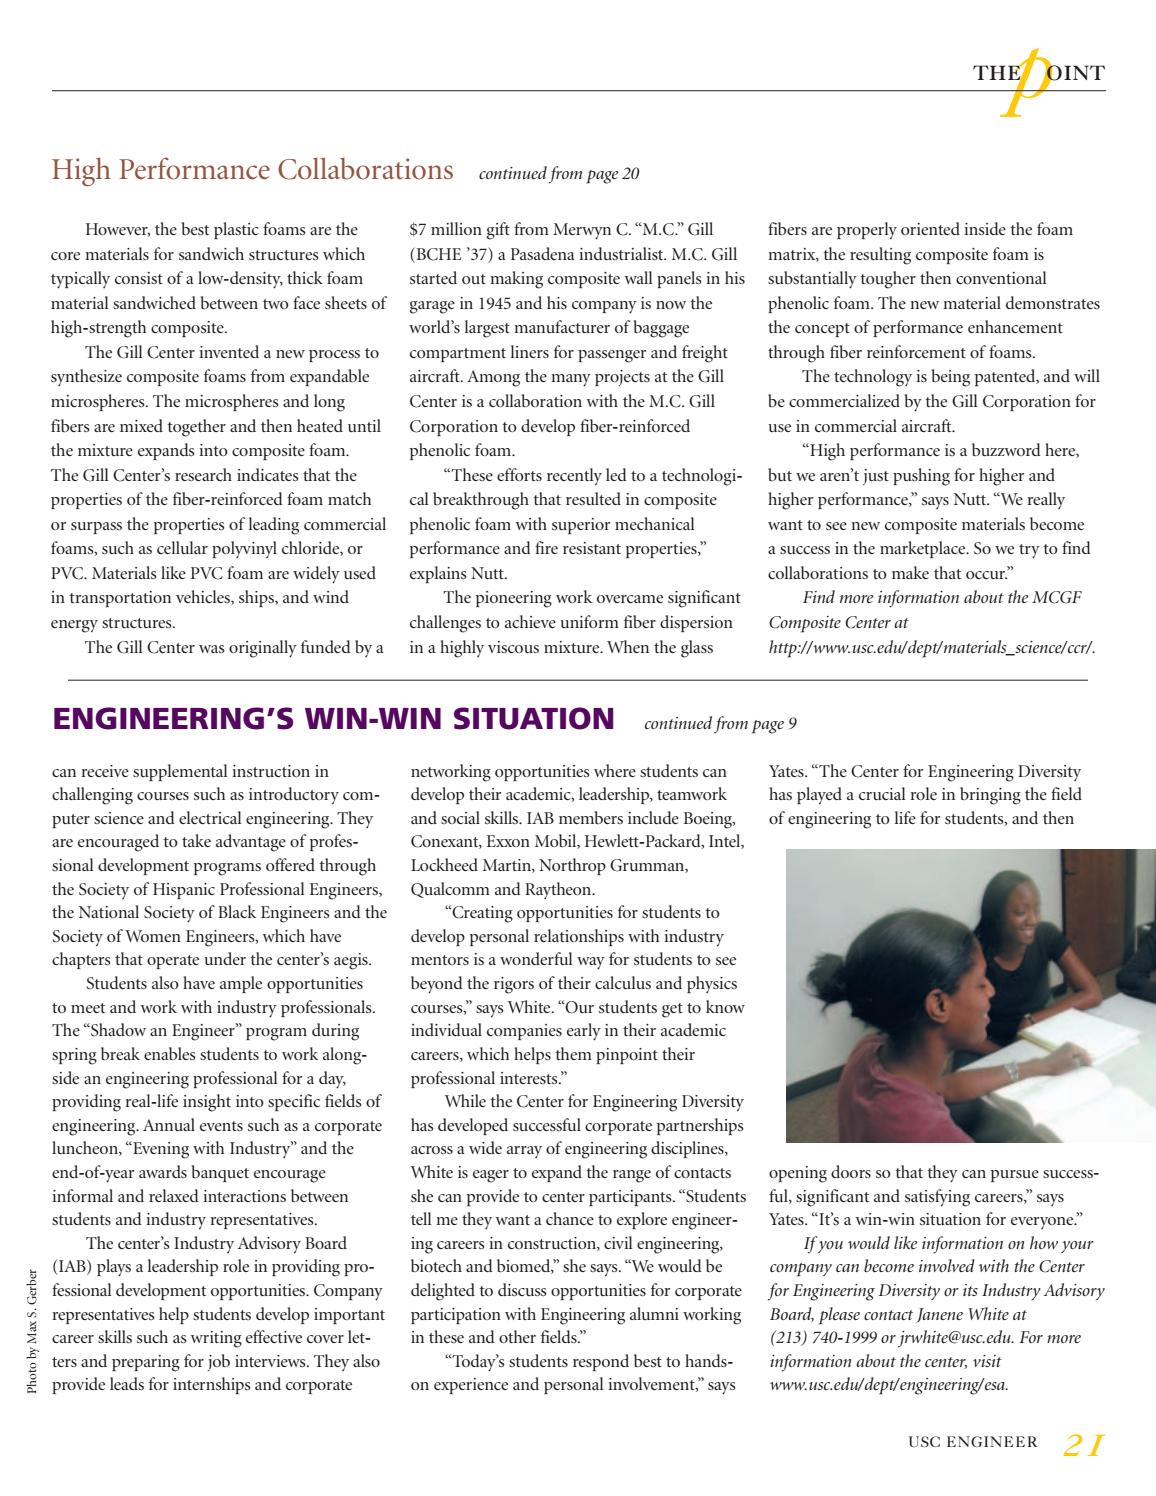 USC Viterbi Engineer Fall 2003 by University of Southern